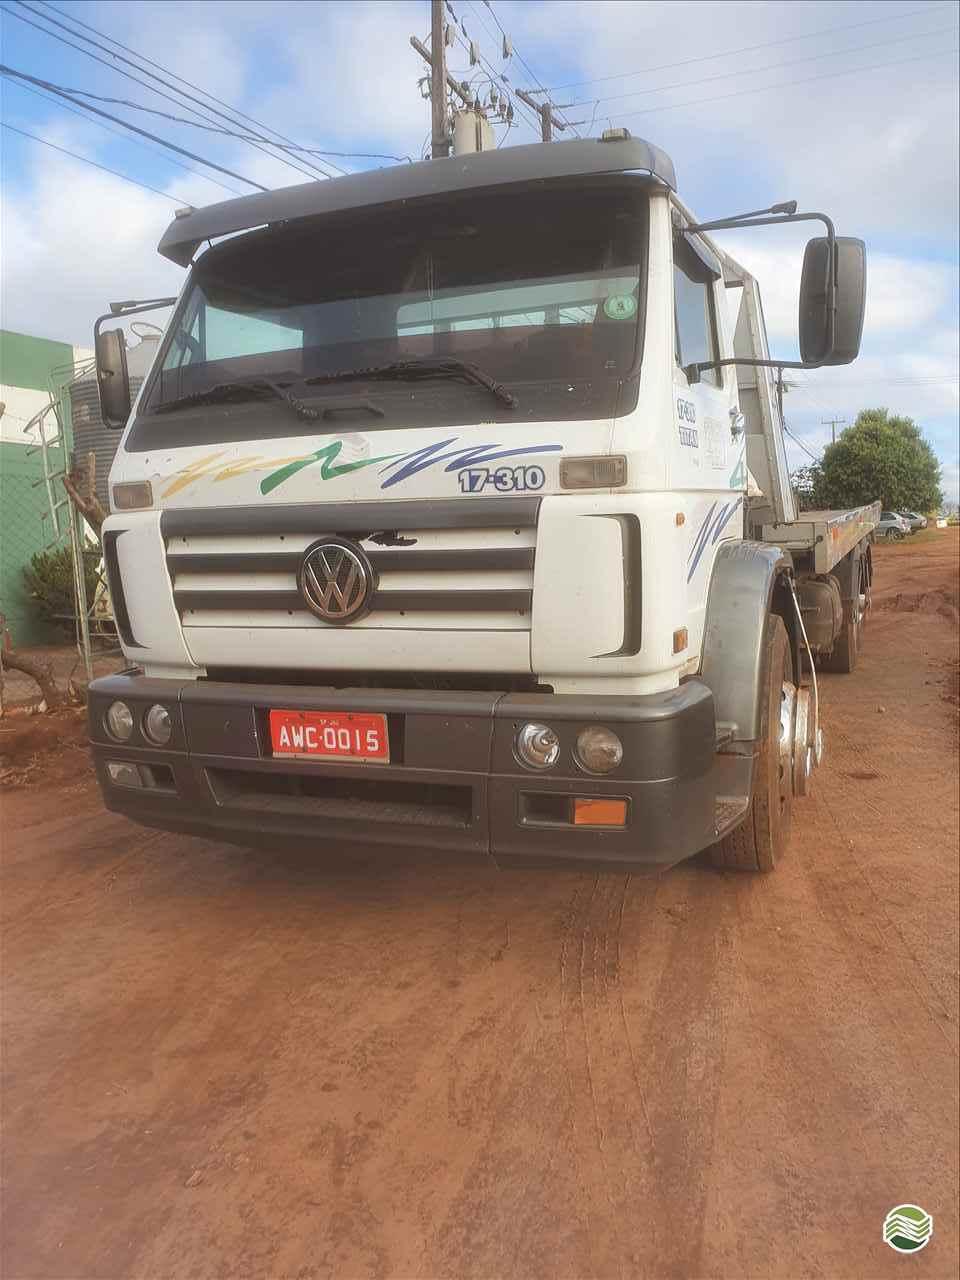 CAMINHAO VOLKSWAGEN VW 17310 Plataforma Guincho Truck 6x2 Implementos Betel UMUARAMA PARANÁ PR